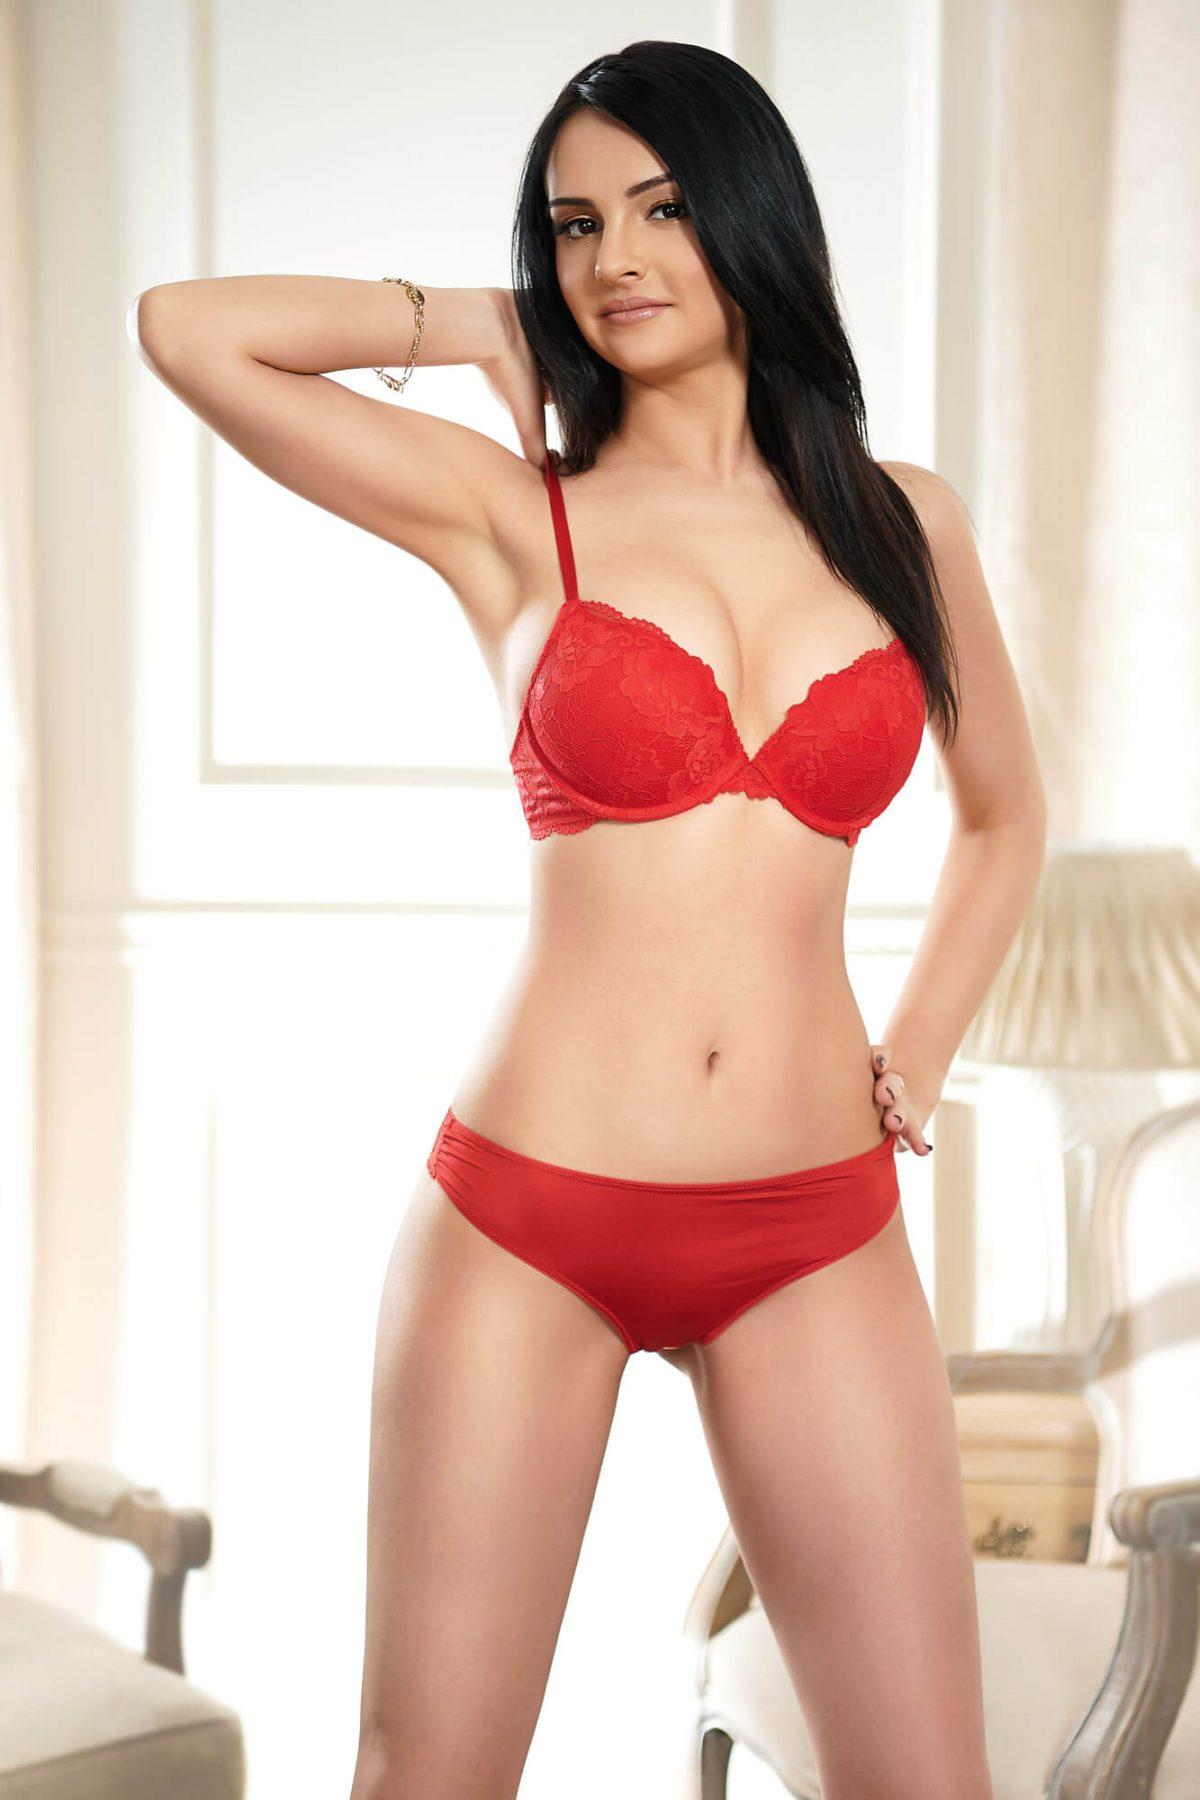 skinny tall young brunette 24c london escort marina (1)